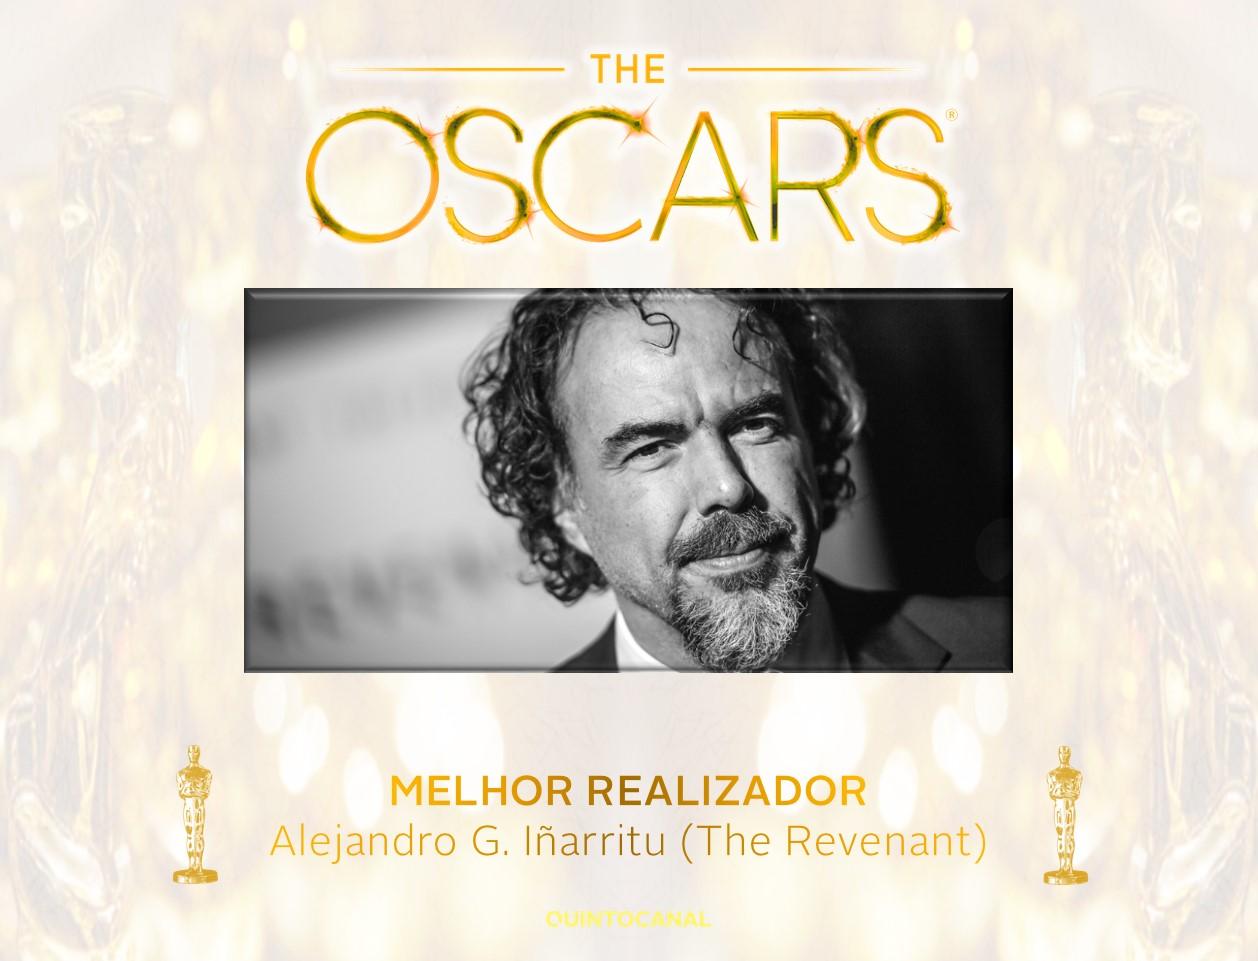 Alejandro G. Iñarritu (The Revenant)